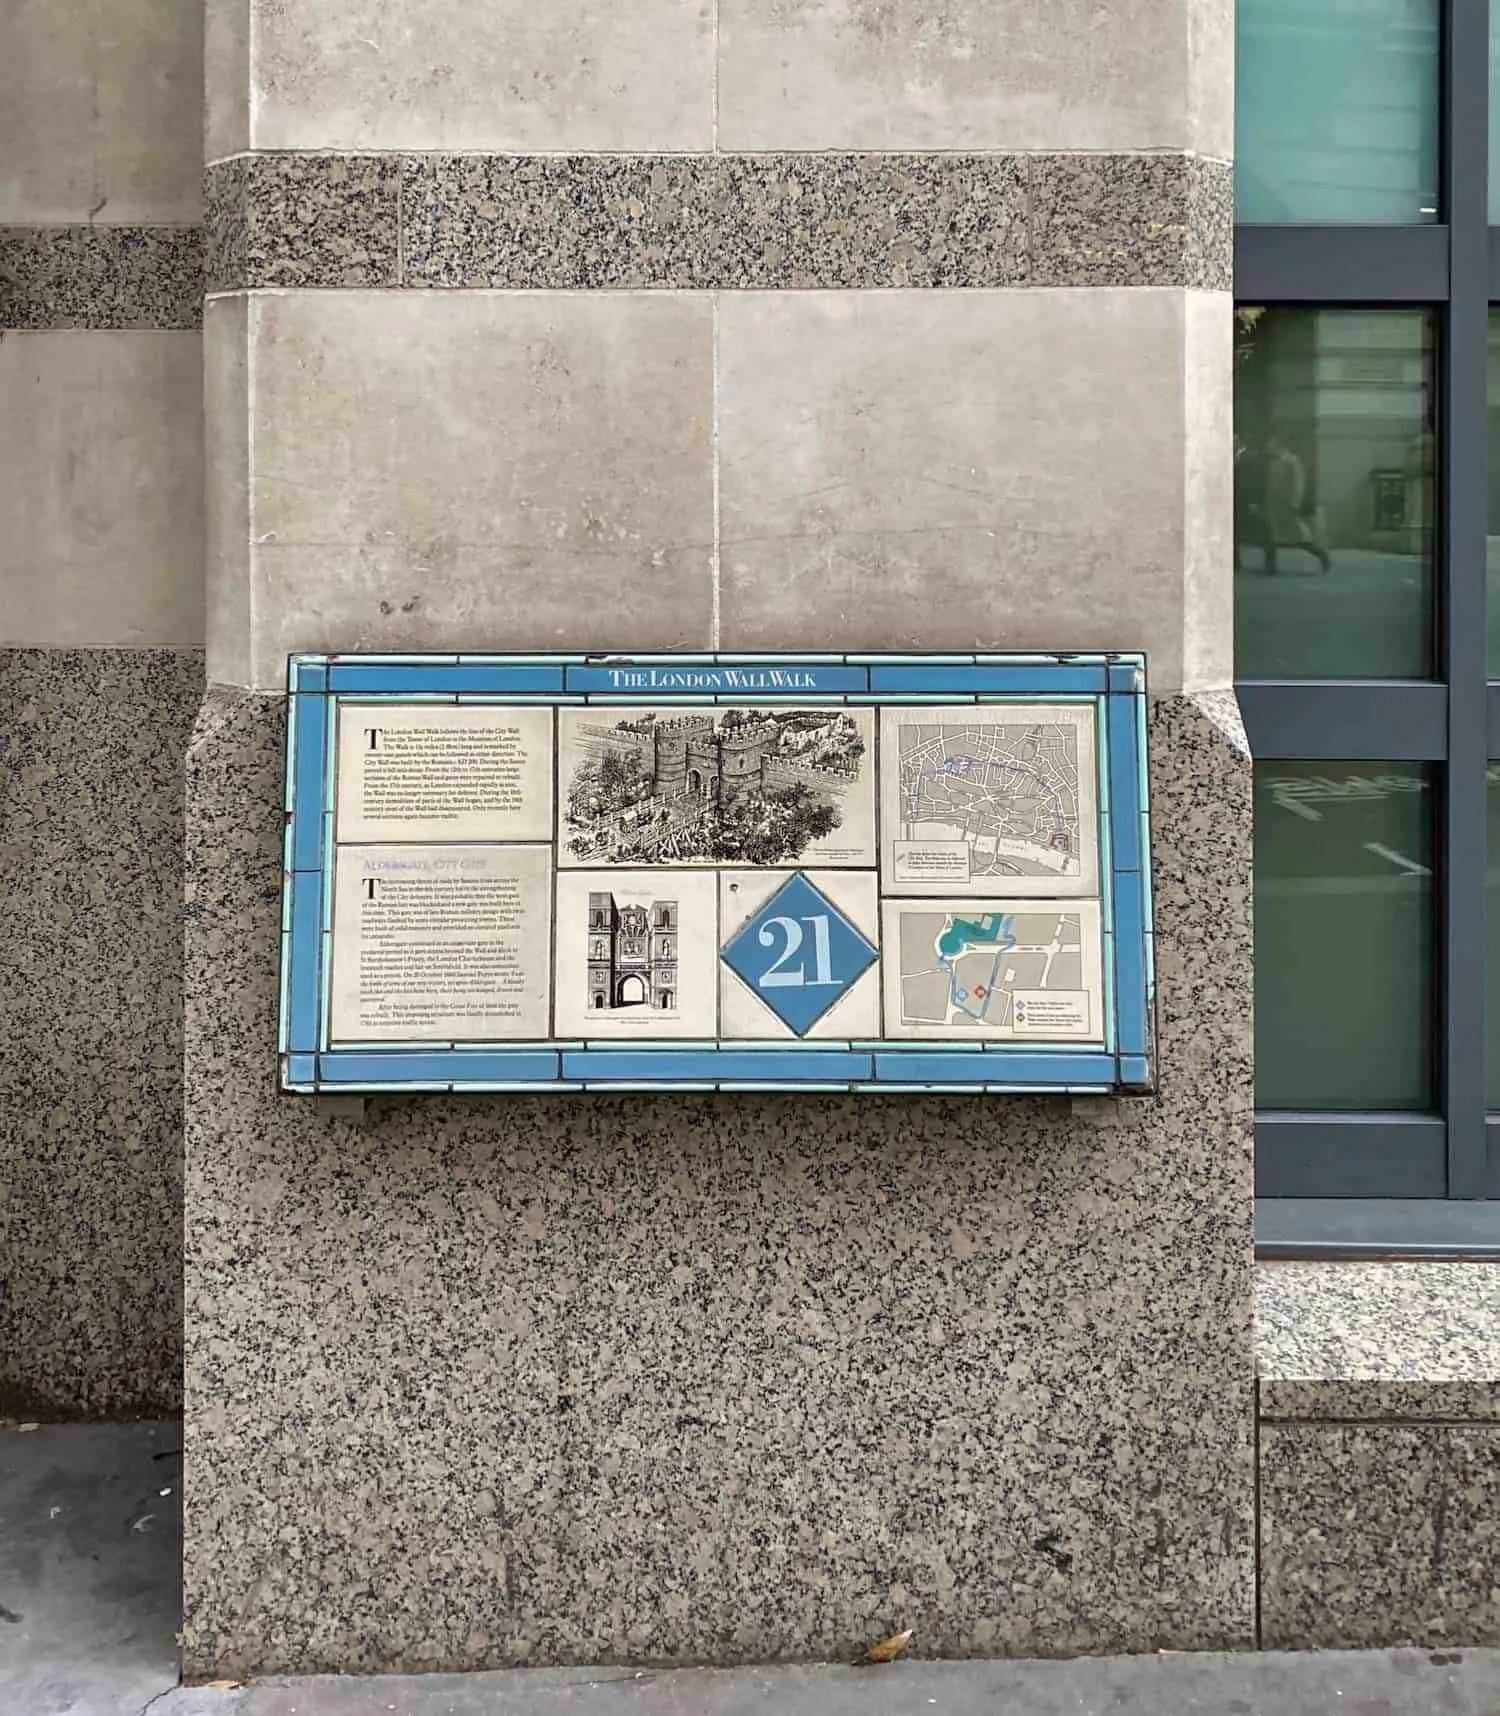 London Wall Walk - Plaque 21